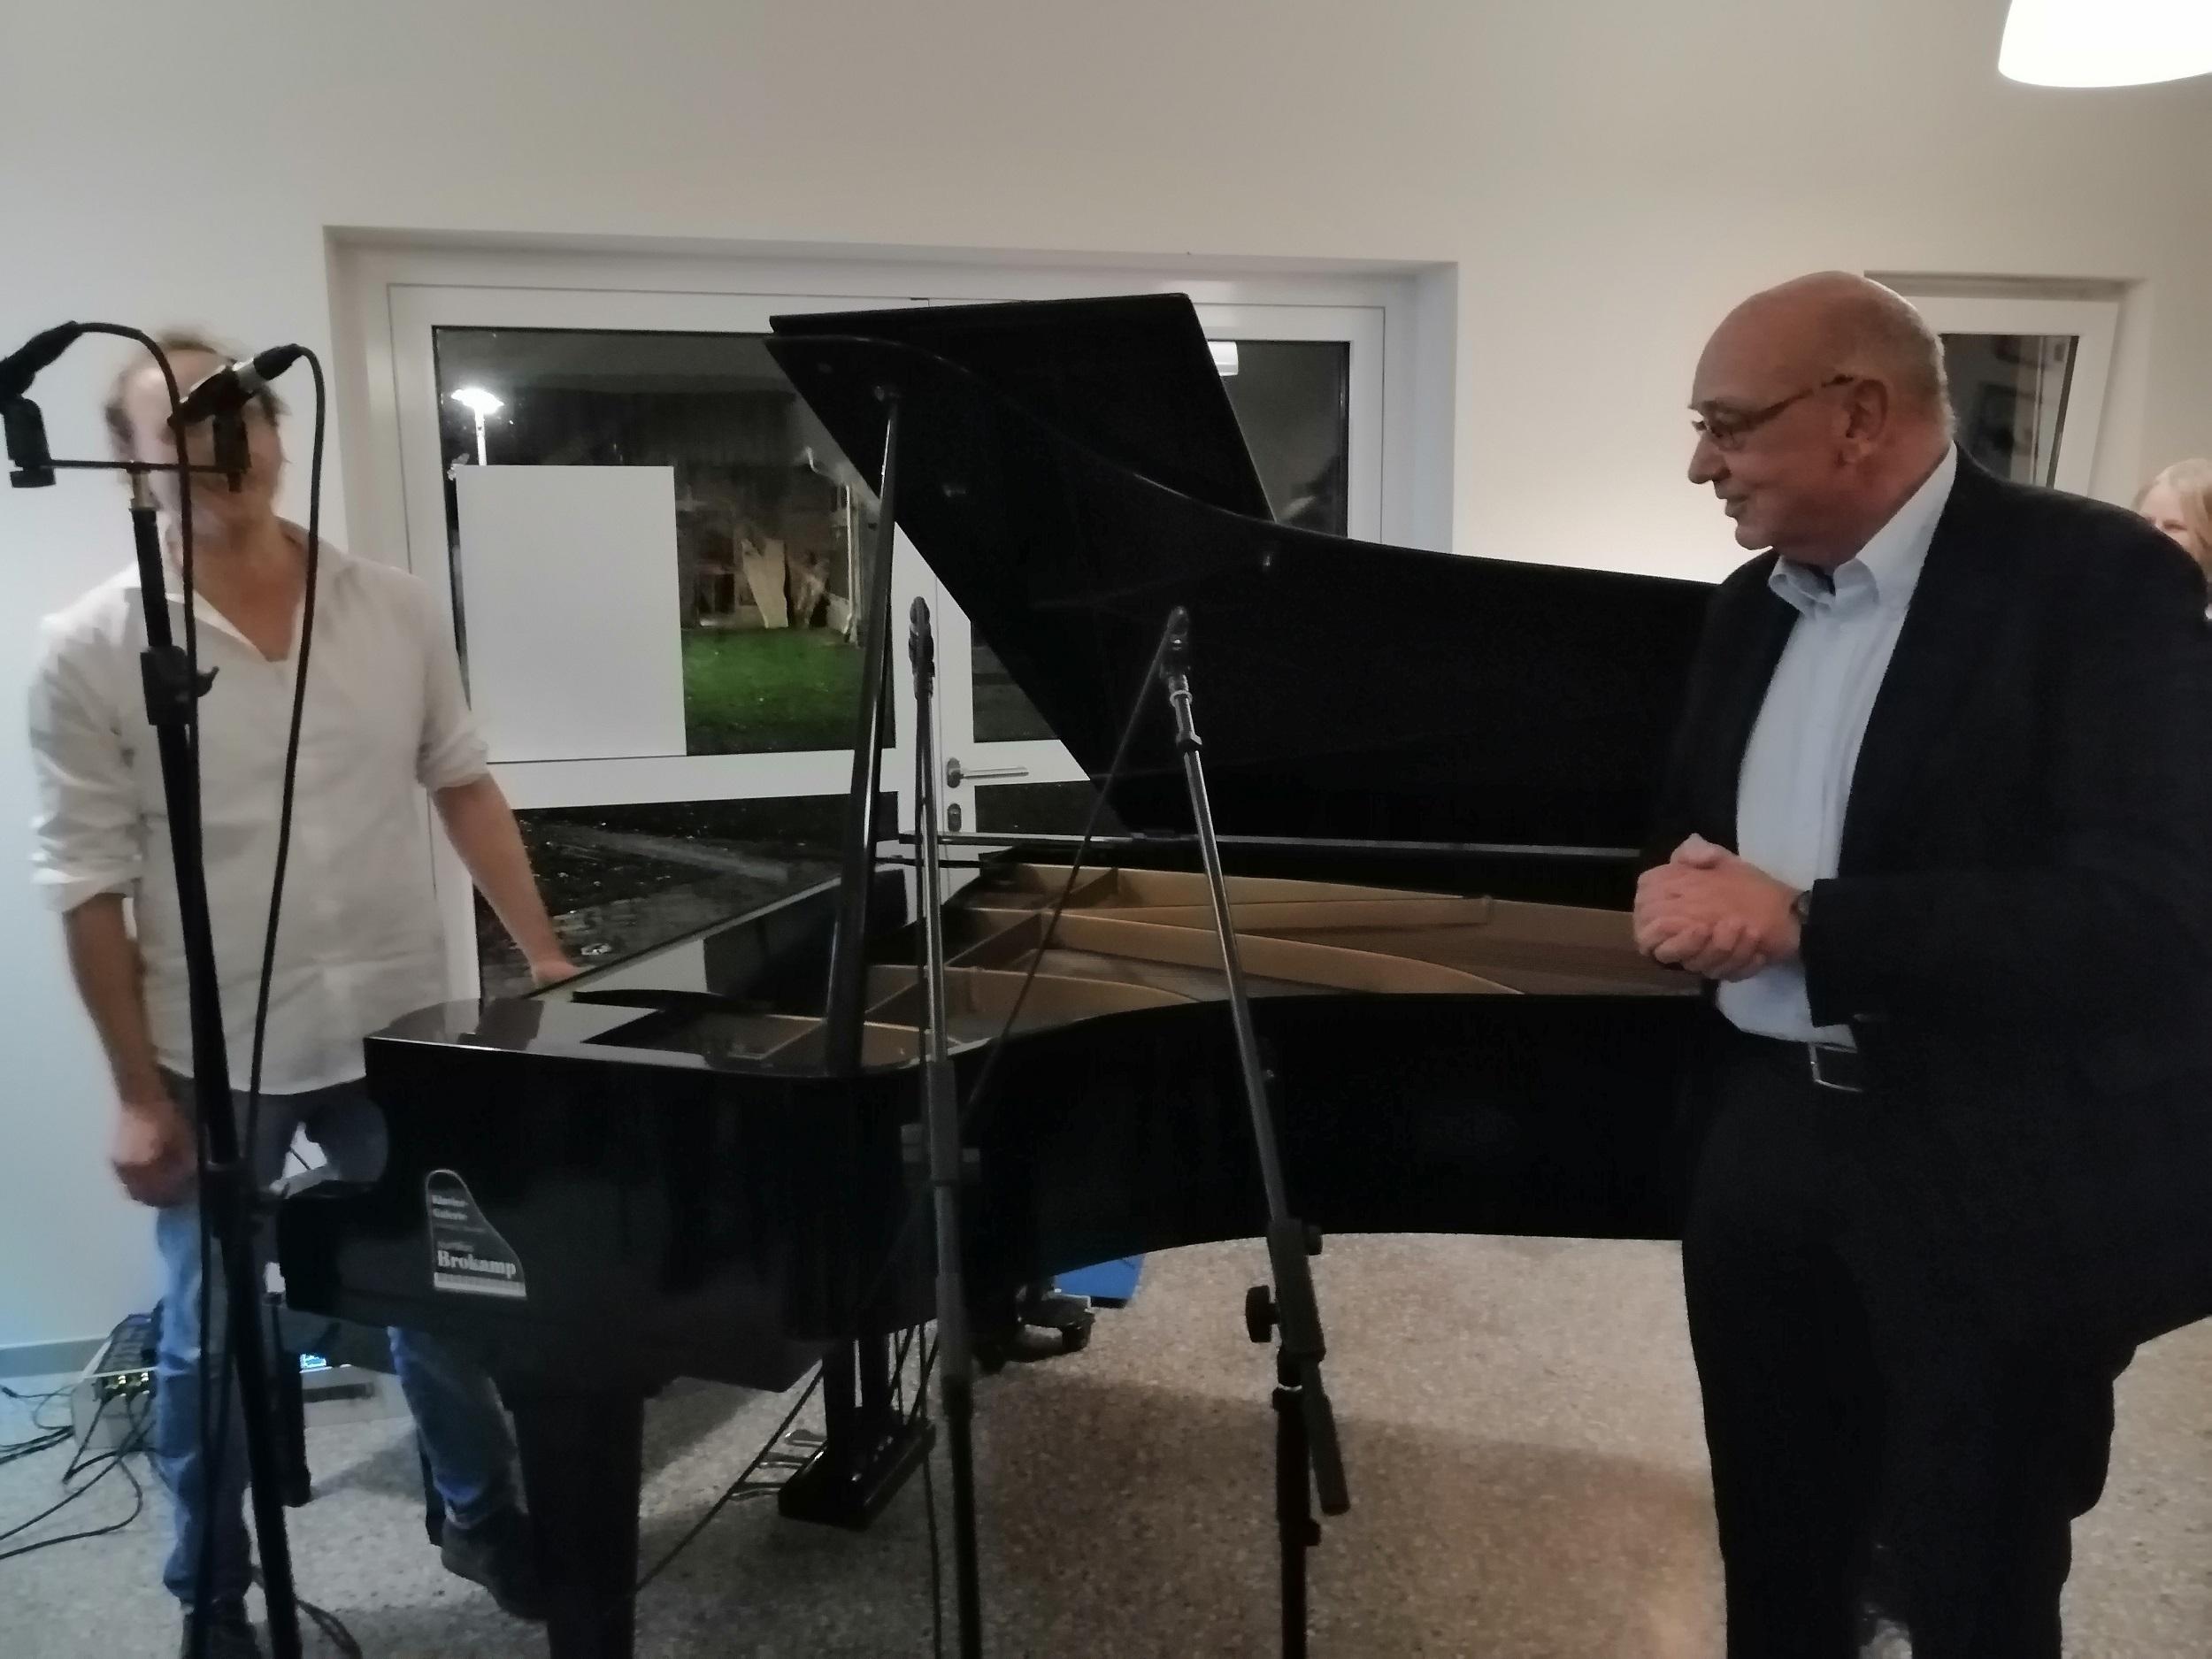 2019 11 03 Klavierkonzert 4